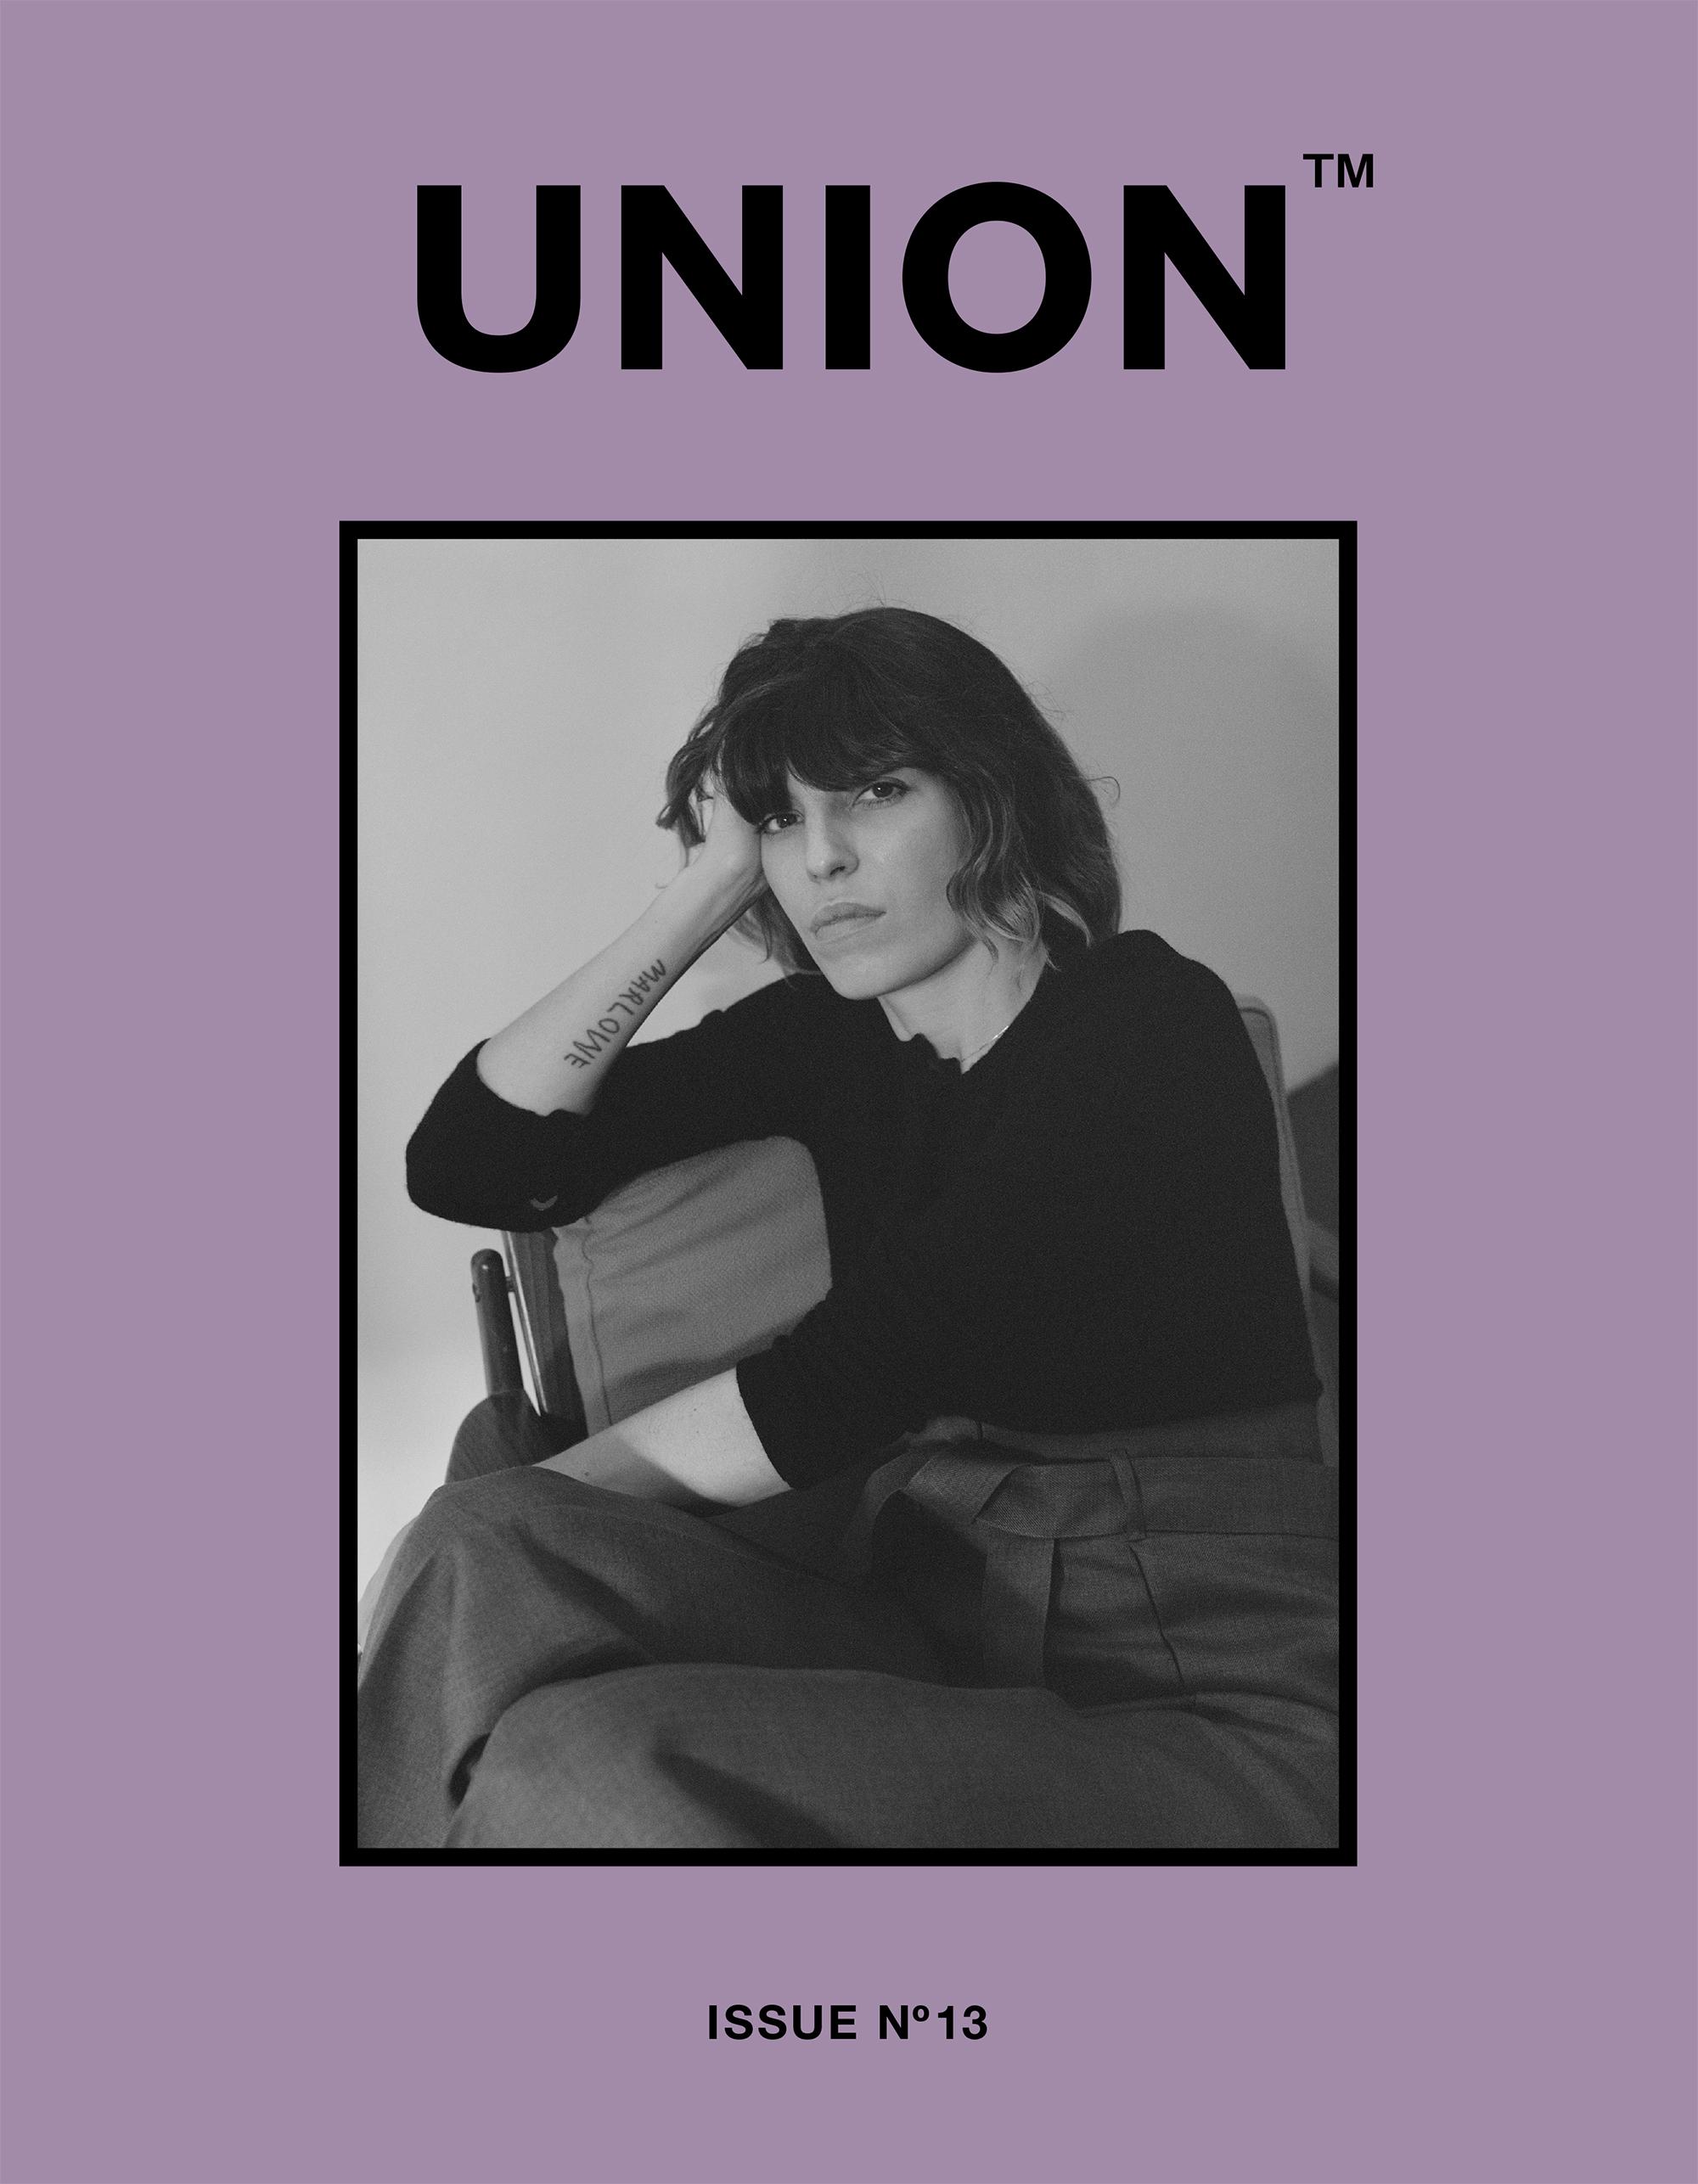 Union-Cover-#13-1.jpg